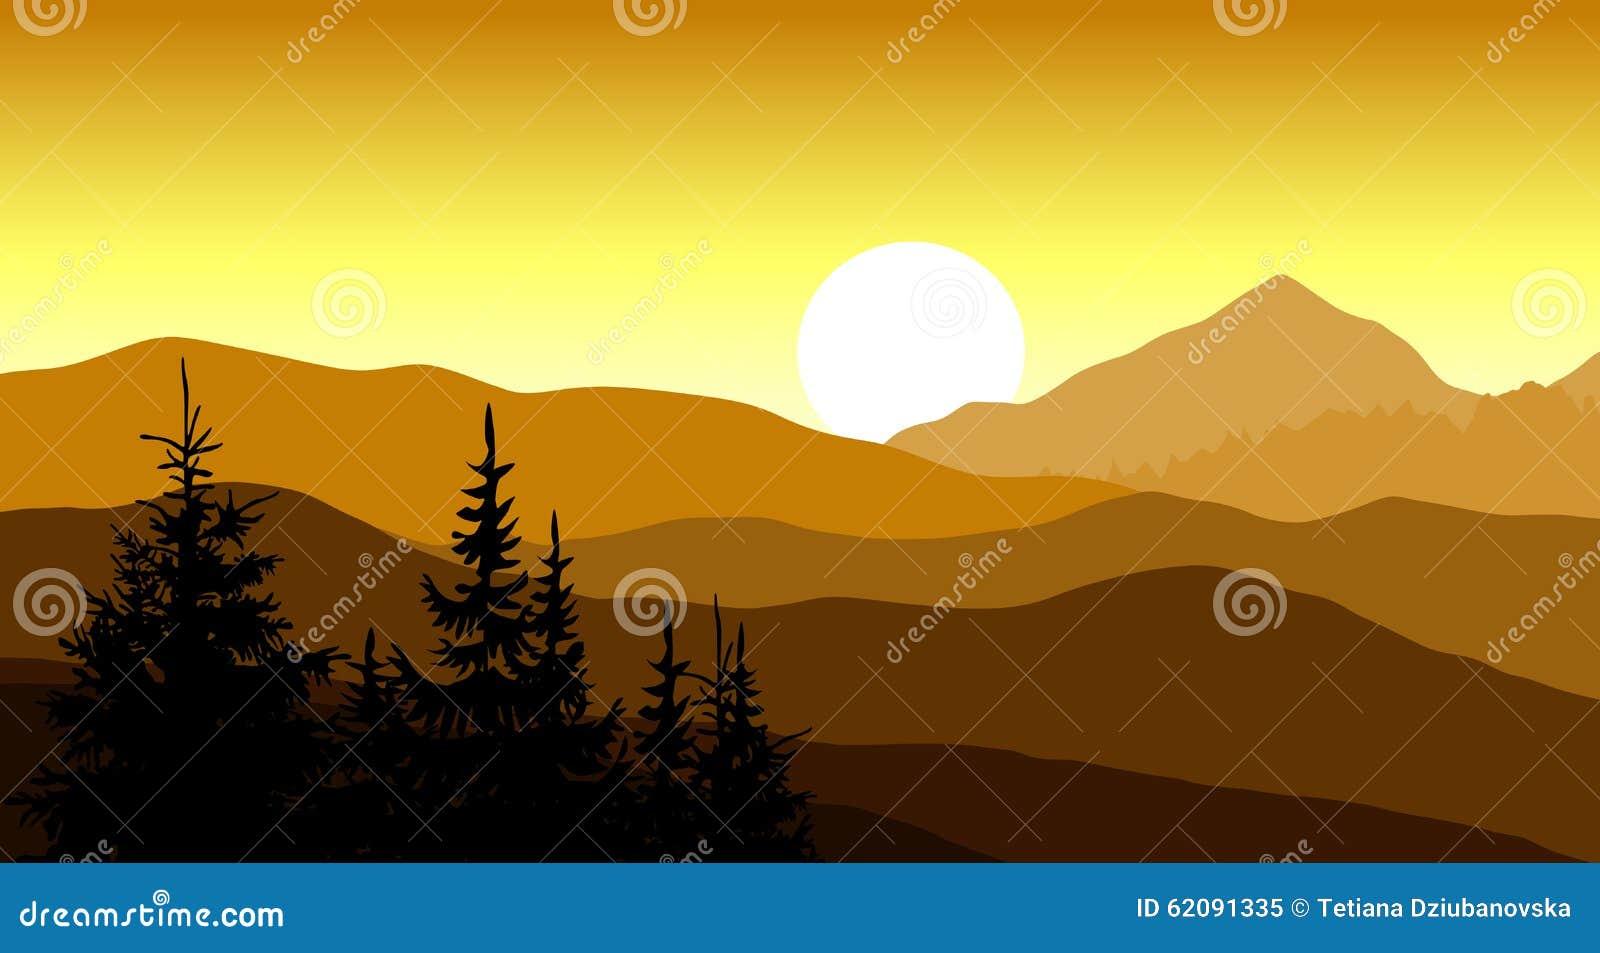 golden sunset in the mountains vector illustration illustration rh megapixl com Rocky Mountain Clip Art Mountain Range Clip Art